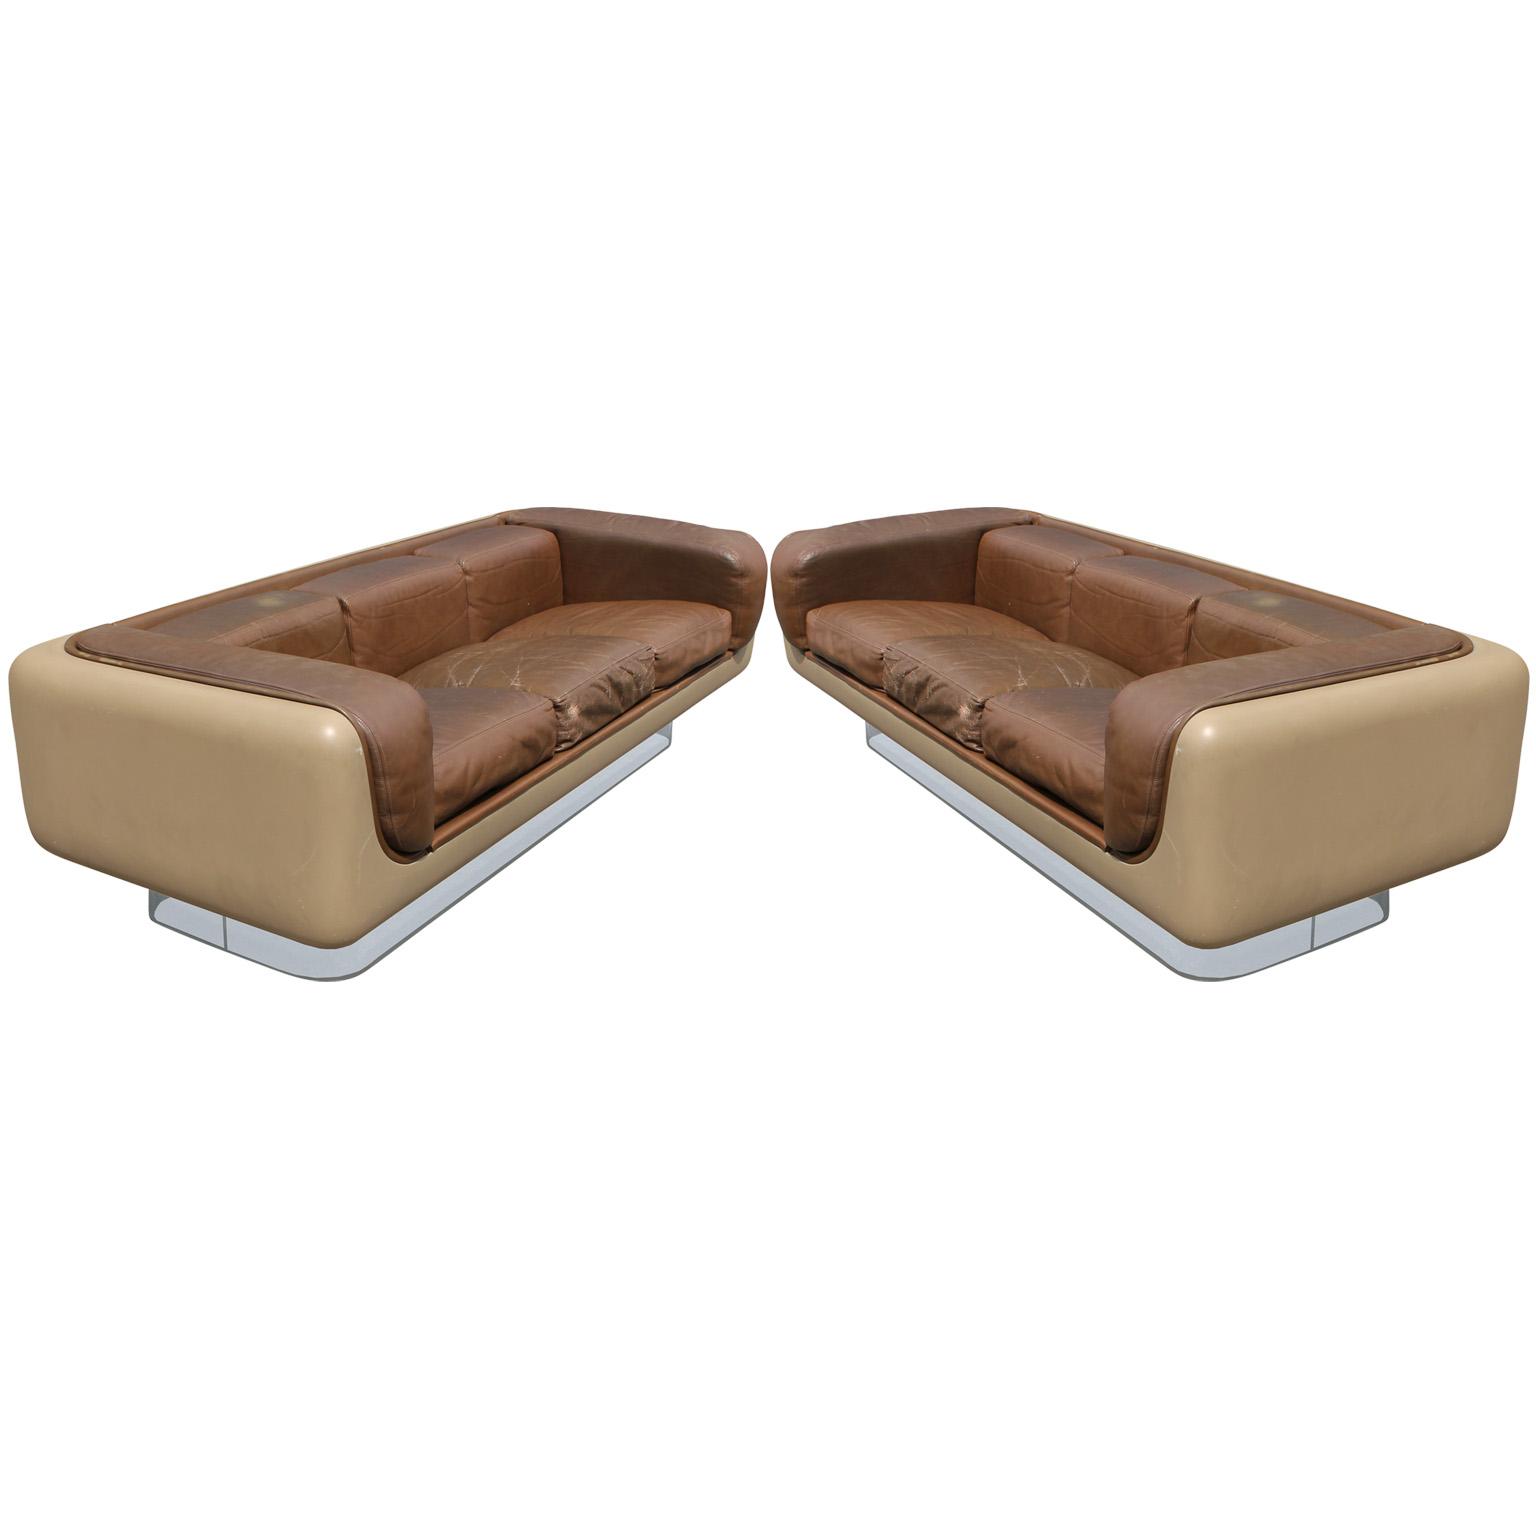 steelcase sofa platner sofas reviews 2017 superb pair of warren for